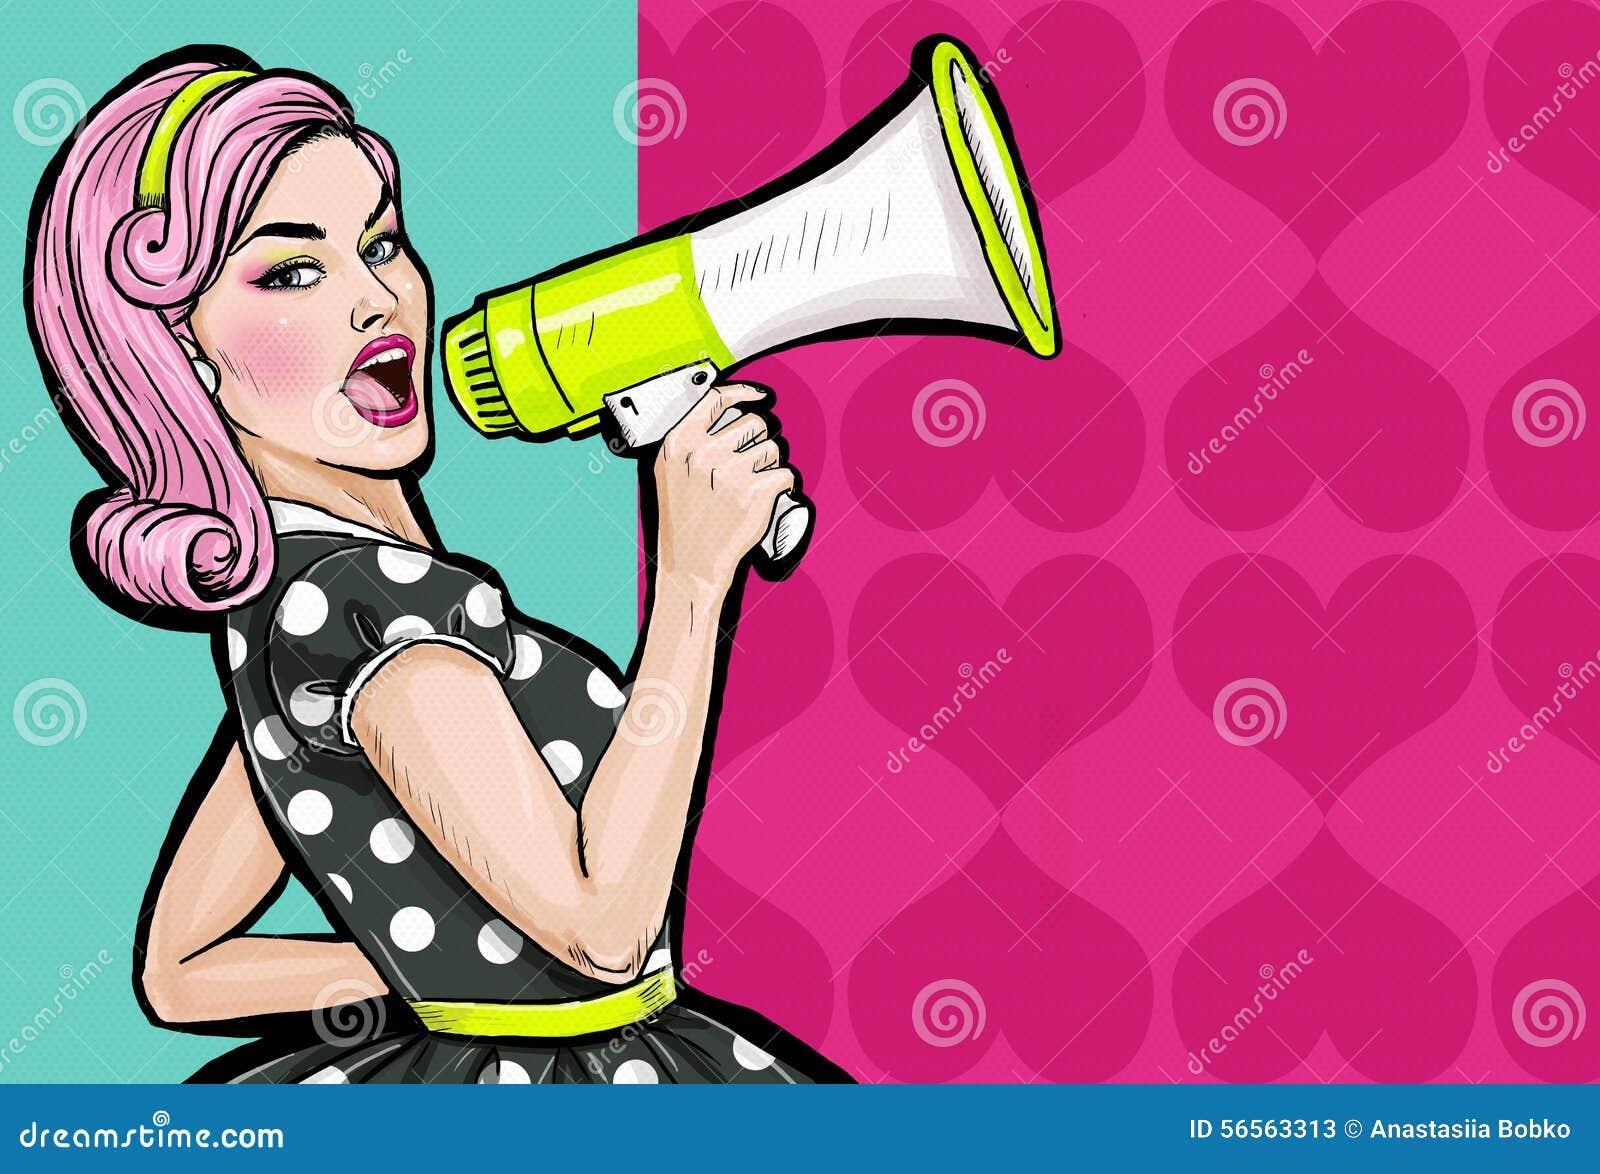 Download Λαϊκό κορίτσι τέχνης με Megaphone Γυναίκα με το μεγάφωνο Κορίτσι που αναγγέλλει την έκπτωση ή την πώληση χρονικός καθολικός Ιστός Απεικόνιση αποθεμάτων - εικονογραφία από δικαιώματα, κορίτσι: 56563313